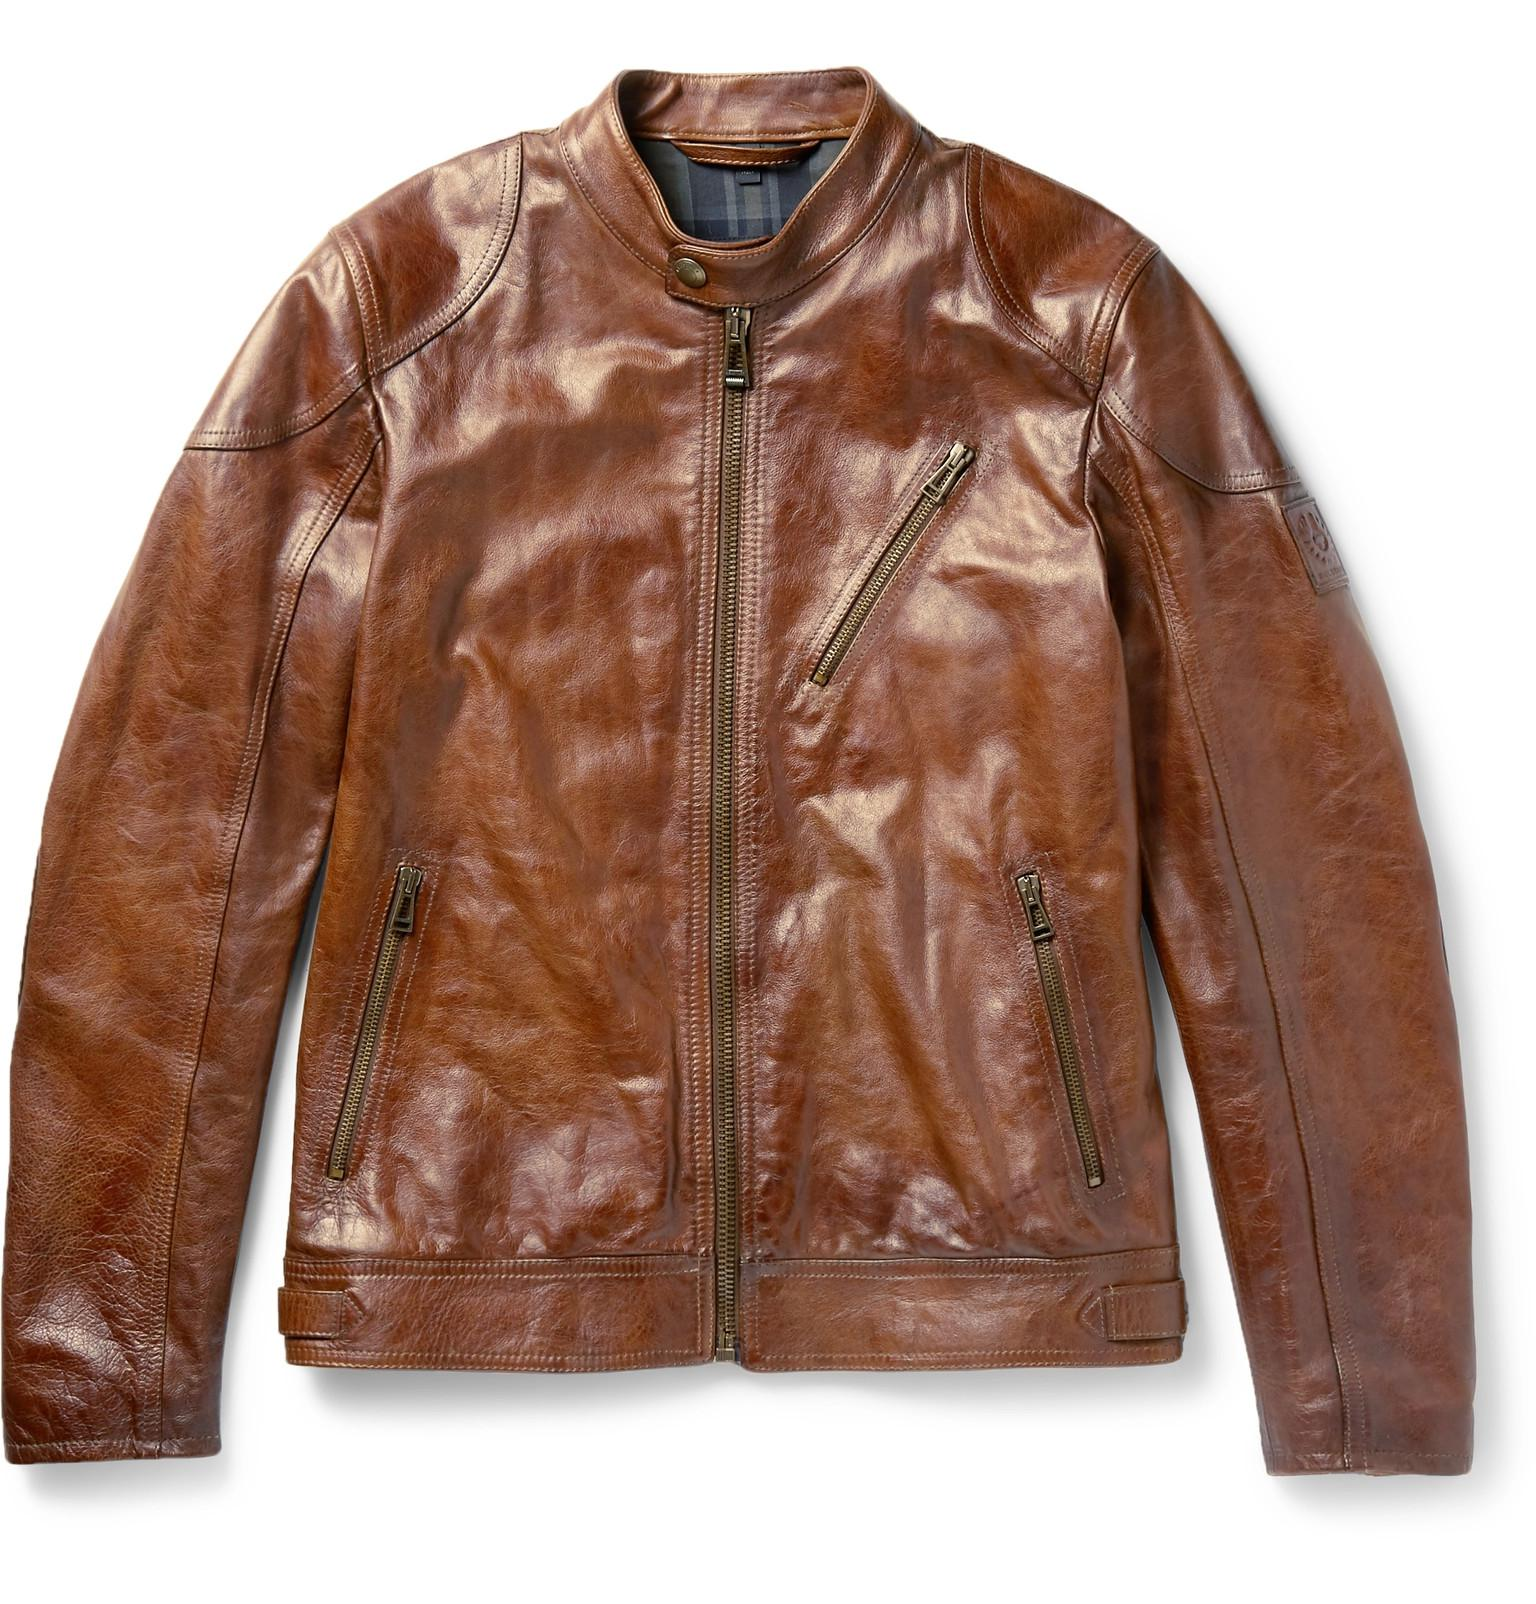 223e173de Belstaff Maxford 2.0 Leather Jacket in Brown for Men - Lyst